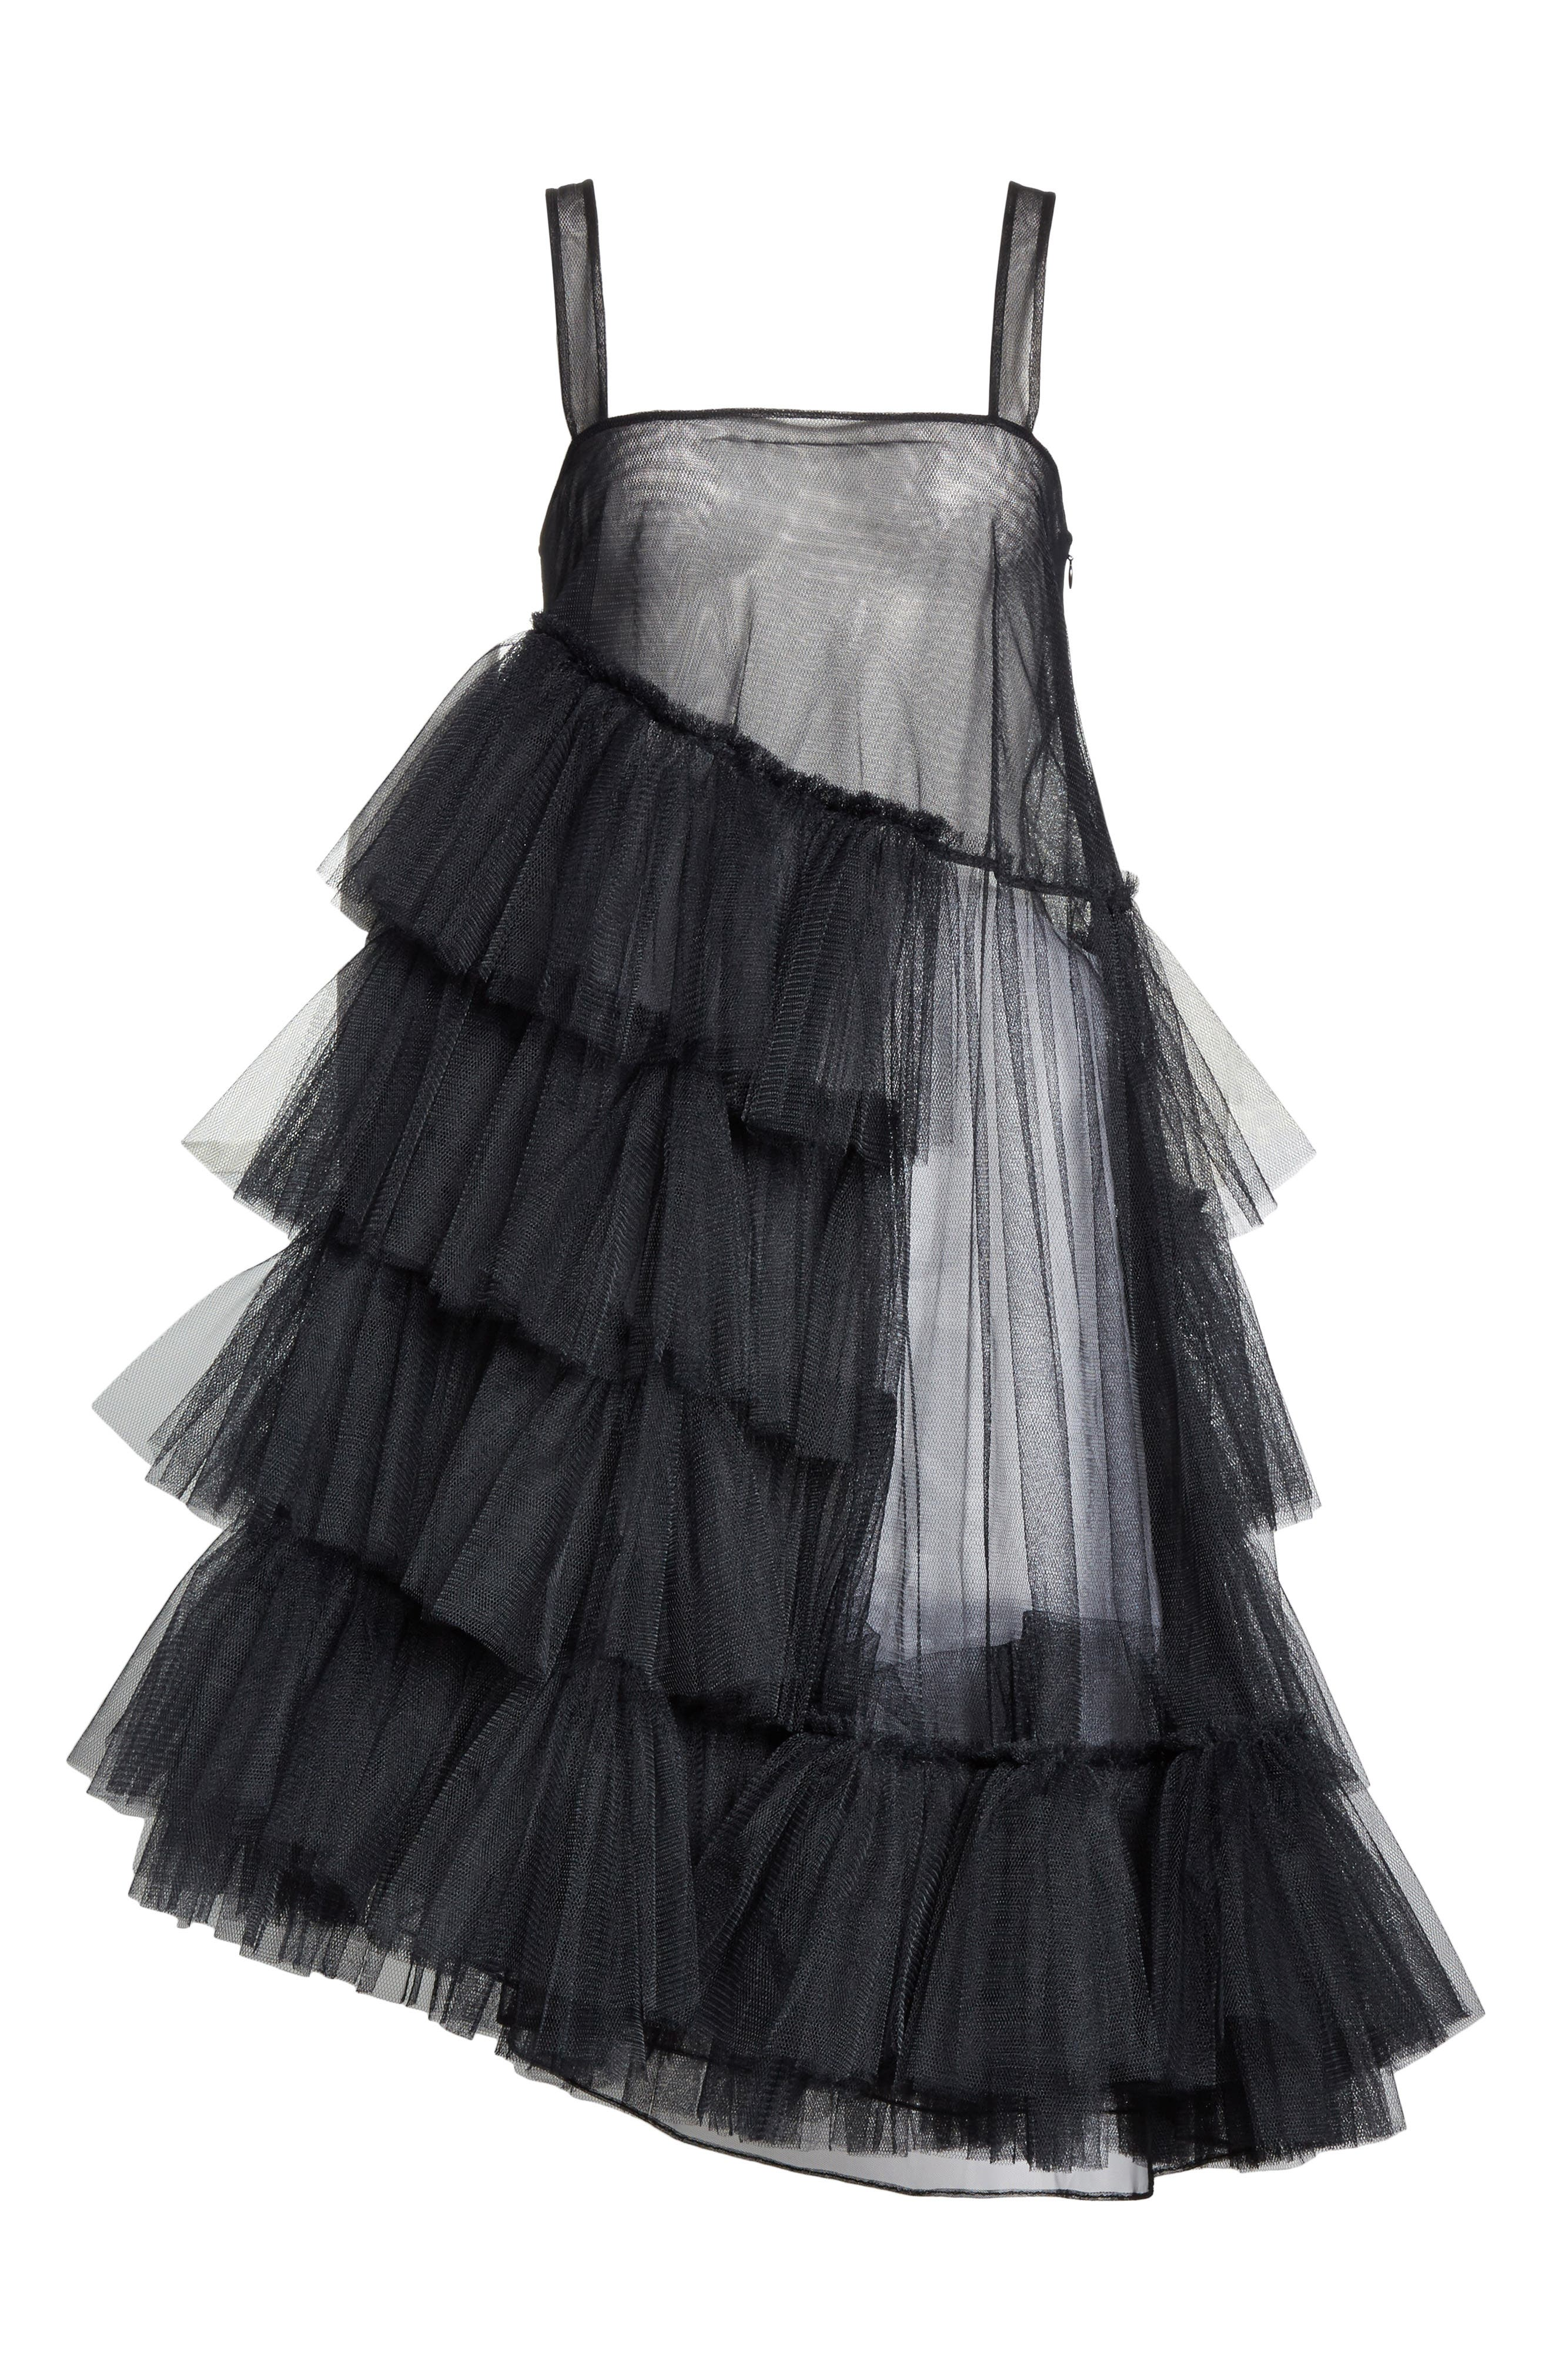 Turbo Tiered Tulle Dress,                             Alternate thumbnail 6, color,                             Black